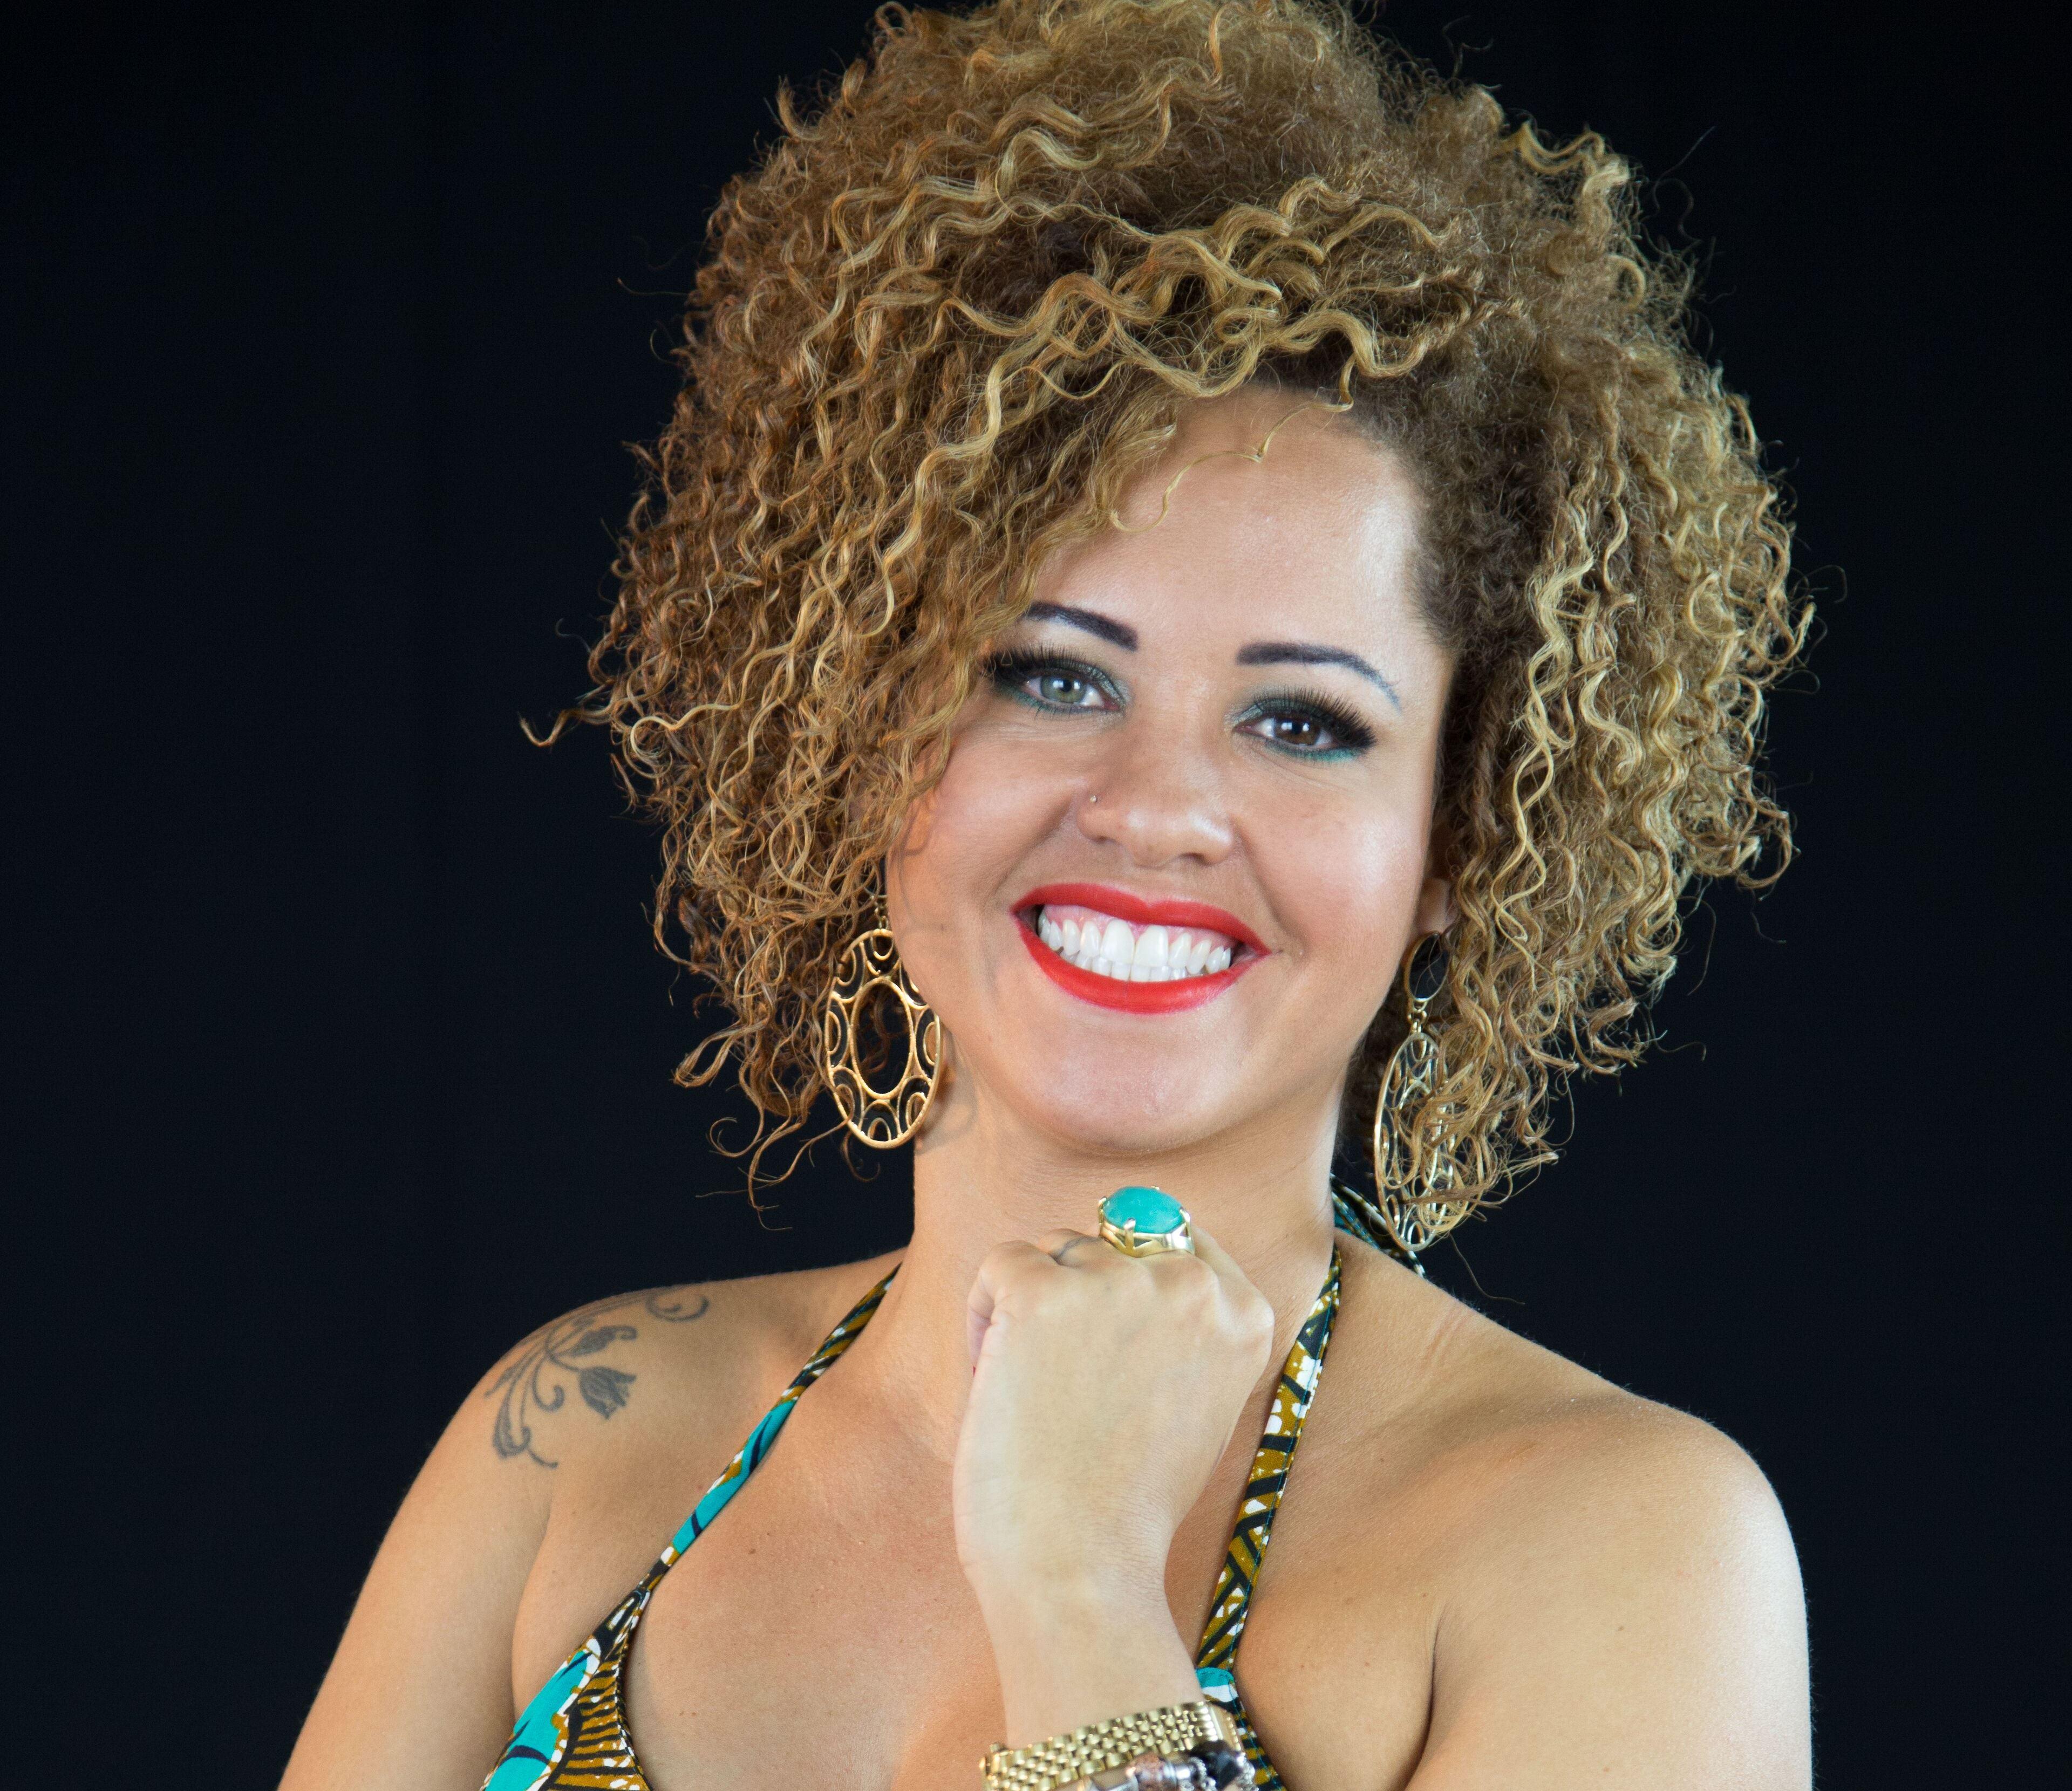 Jane Muniz, Presidente do Spa das Sobrancelhas